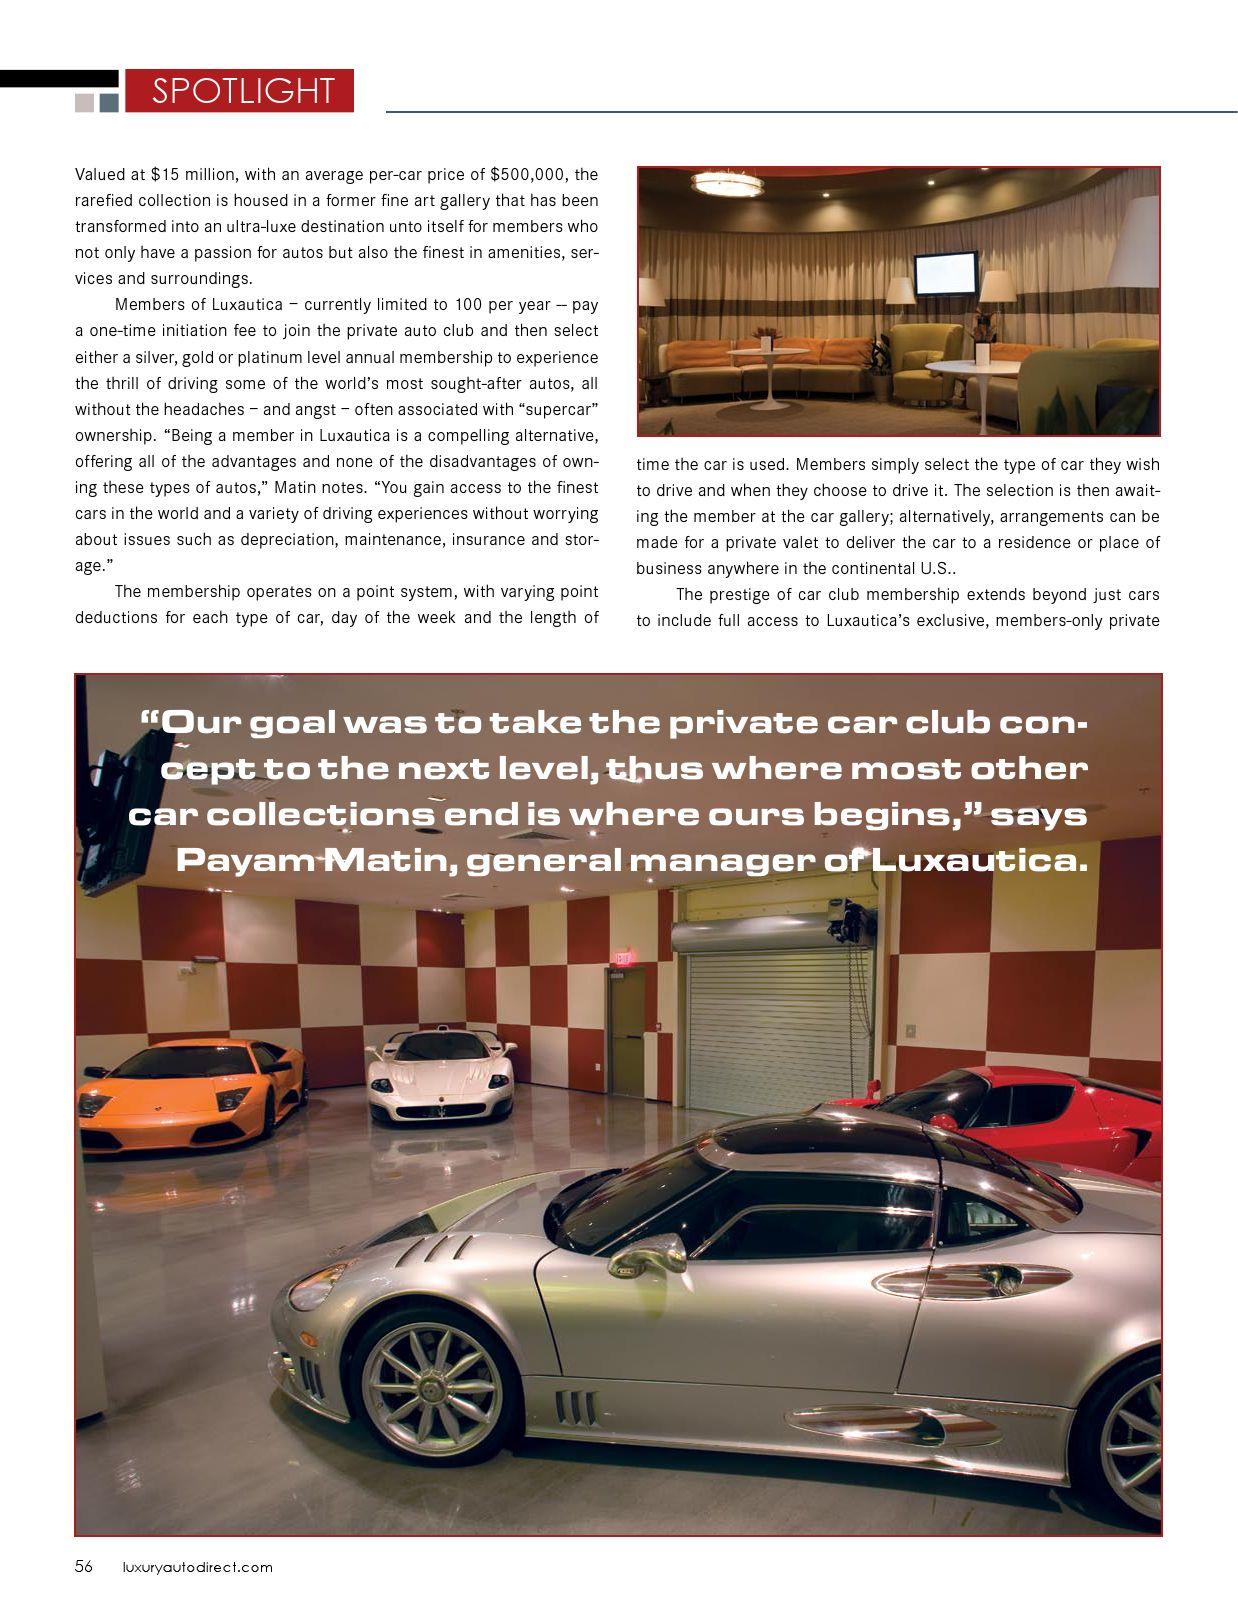 Luxury Auto Direct Magazine by LuxuryAutoDirect com - issuu